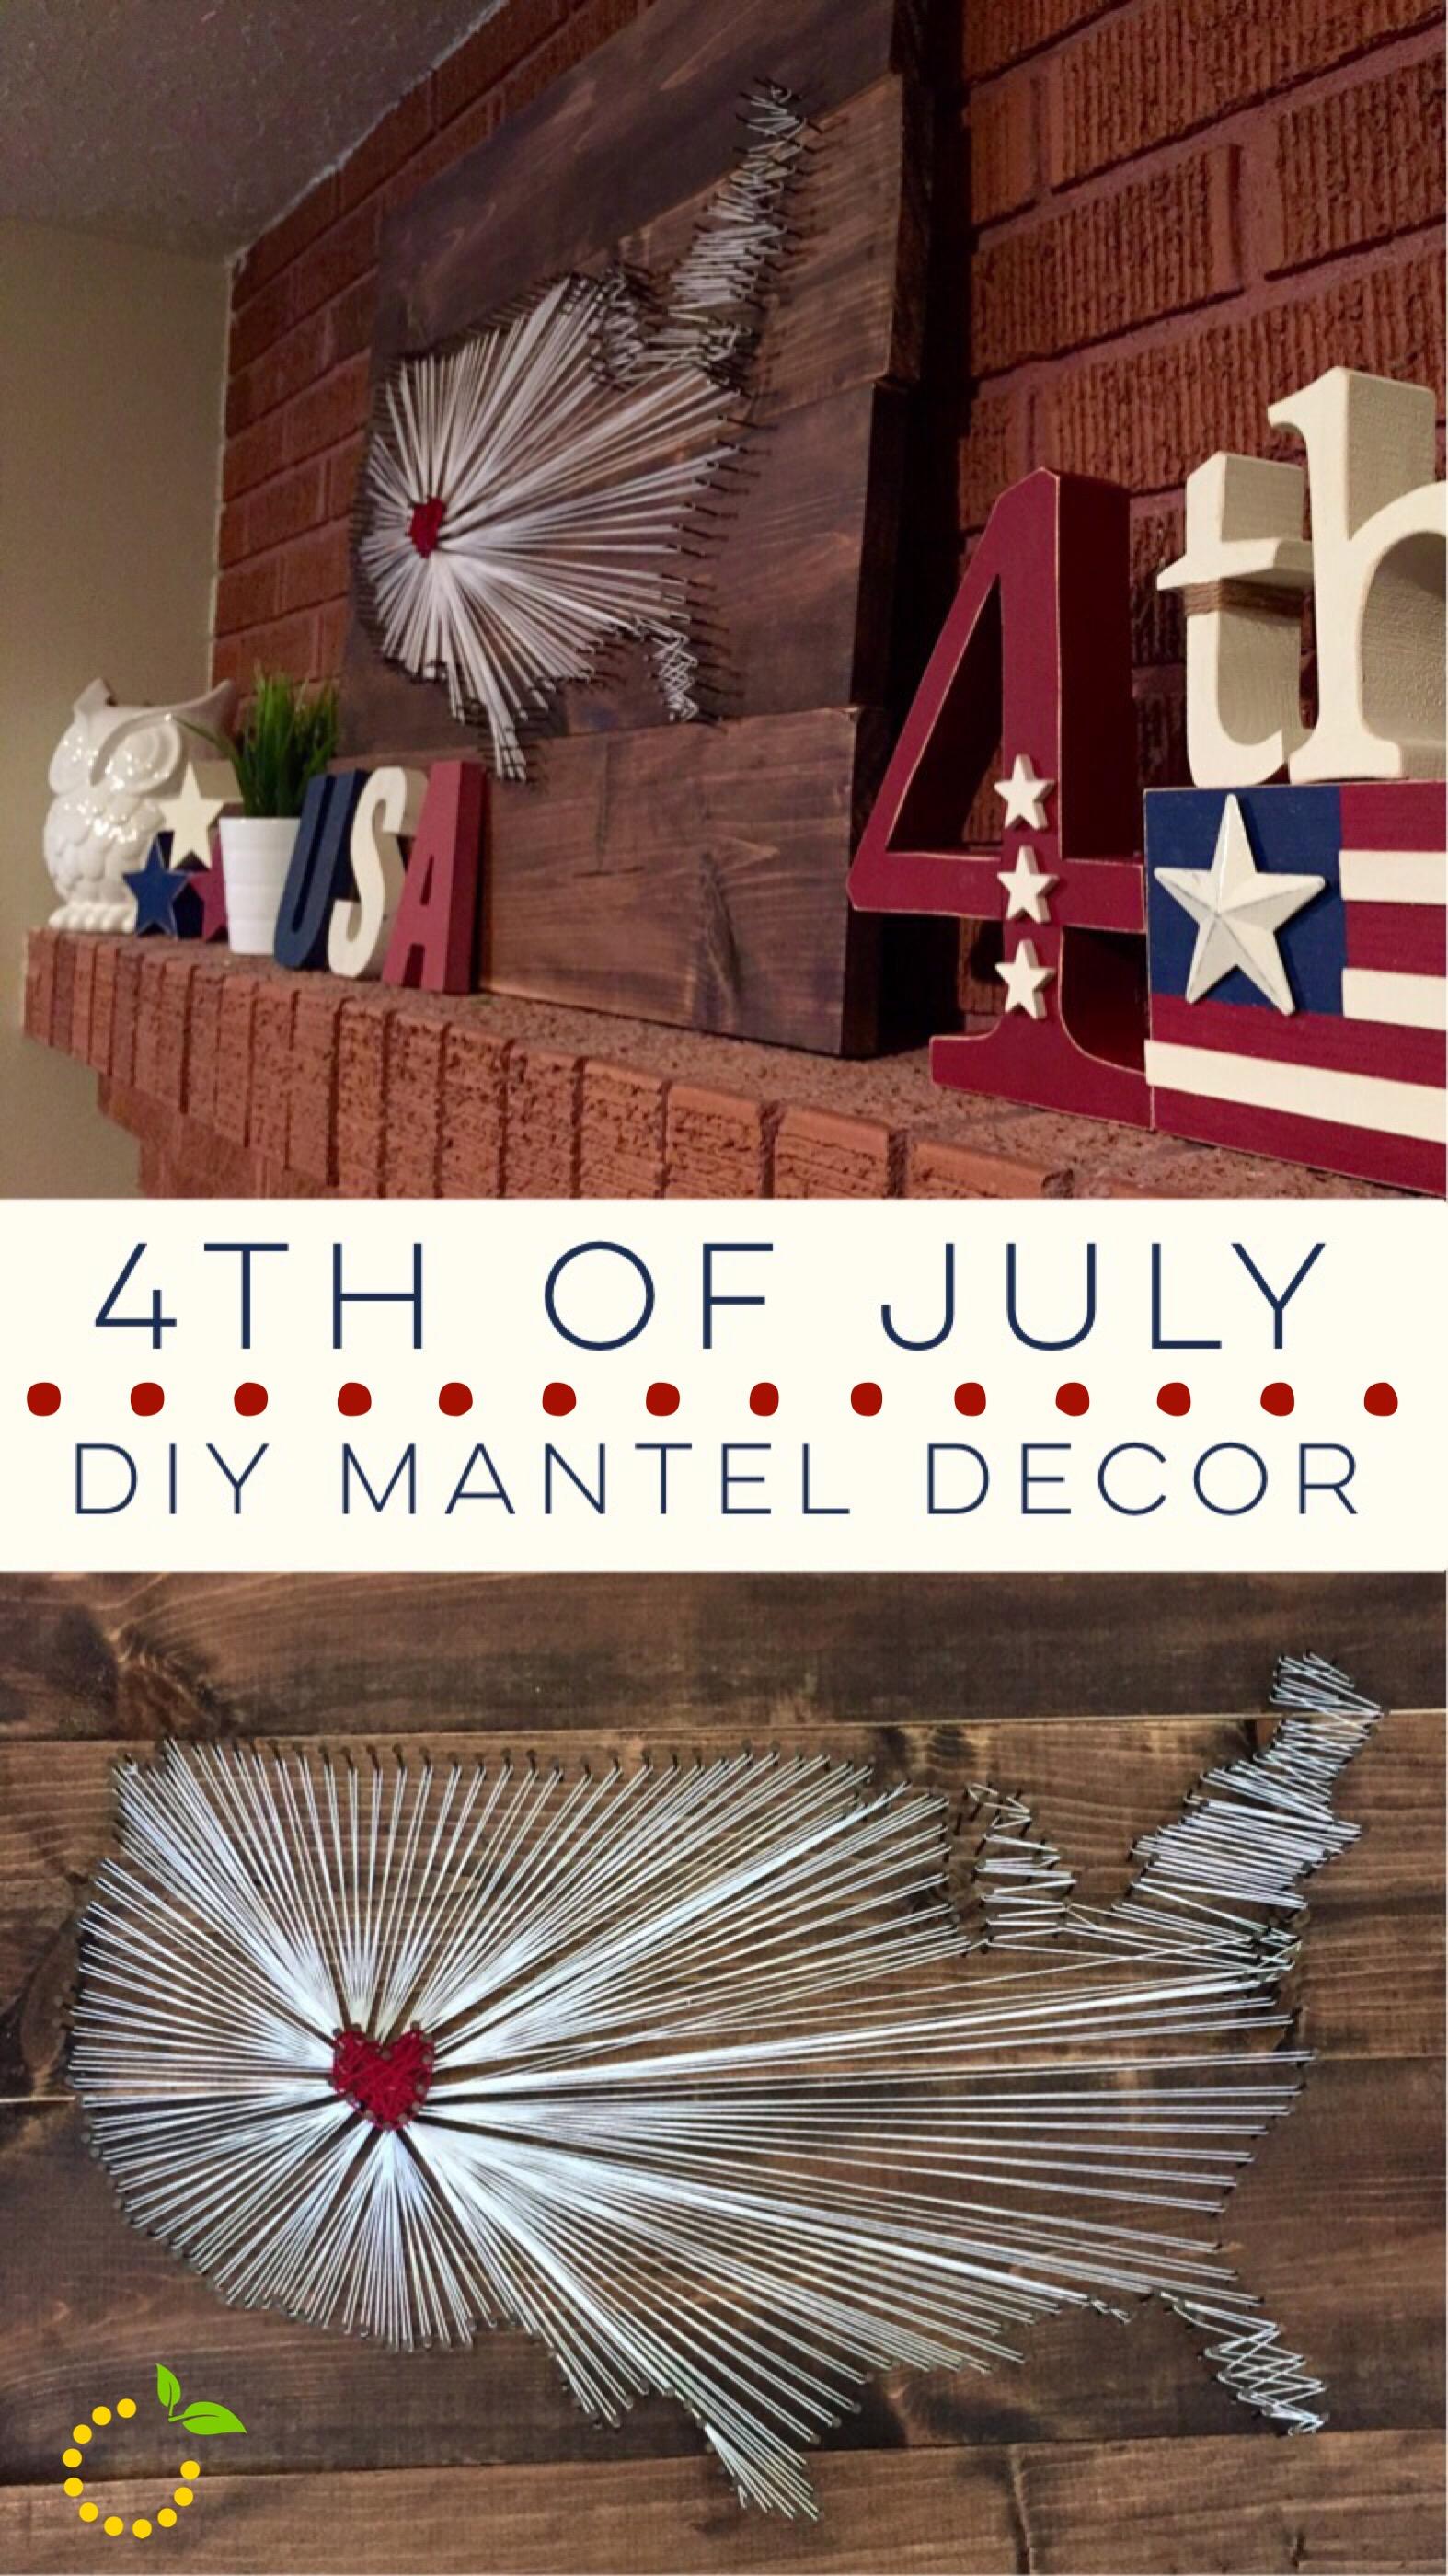 Mantle Decor 4th of July sweetlemonmade.com